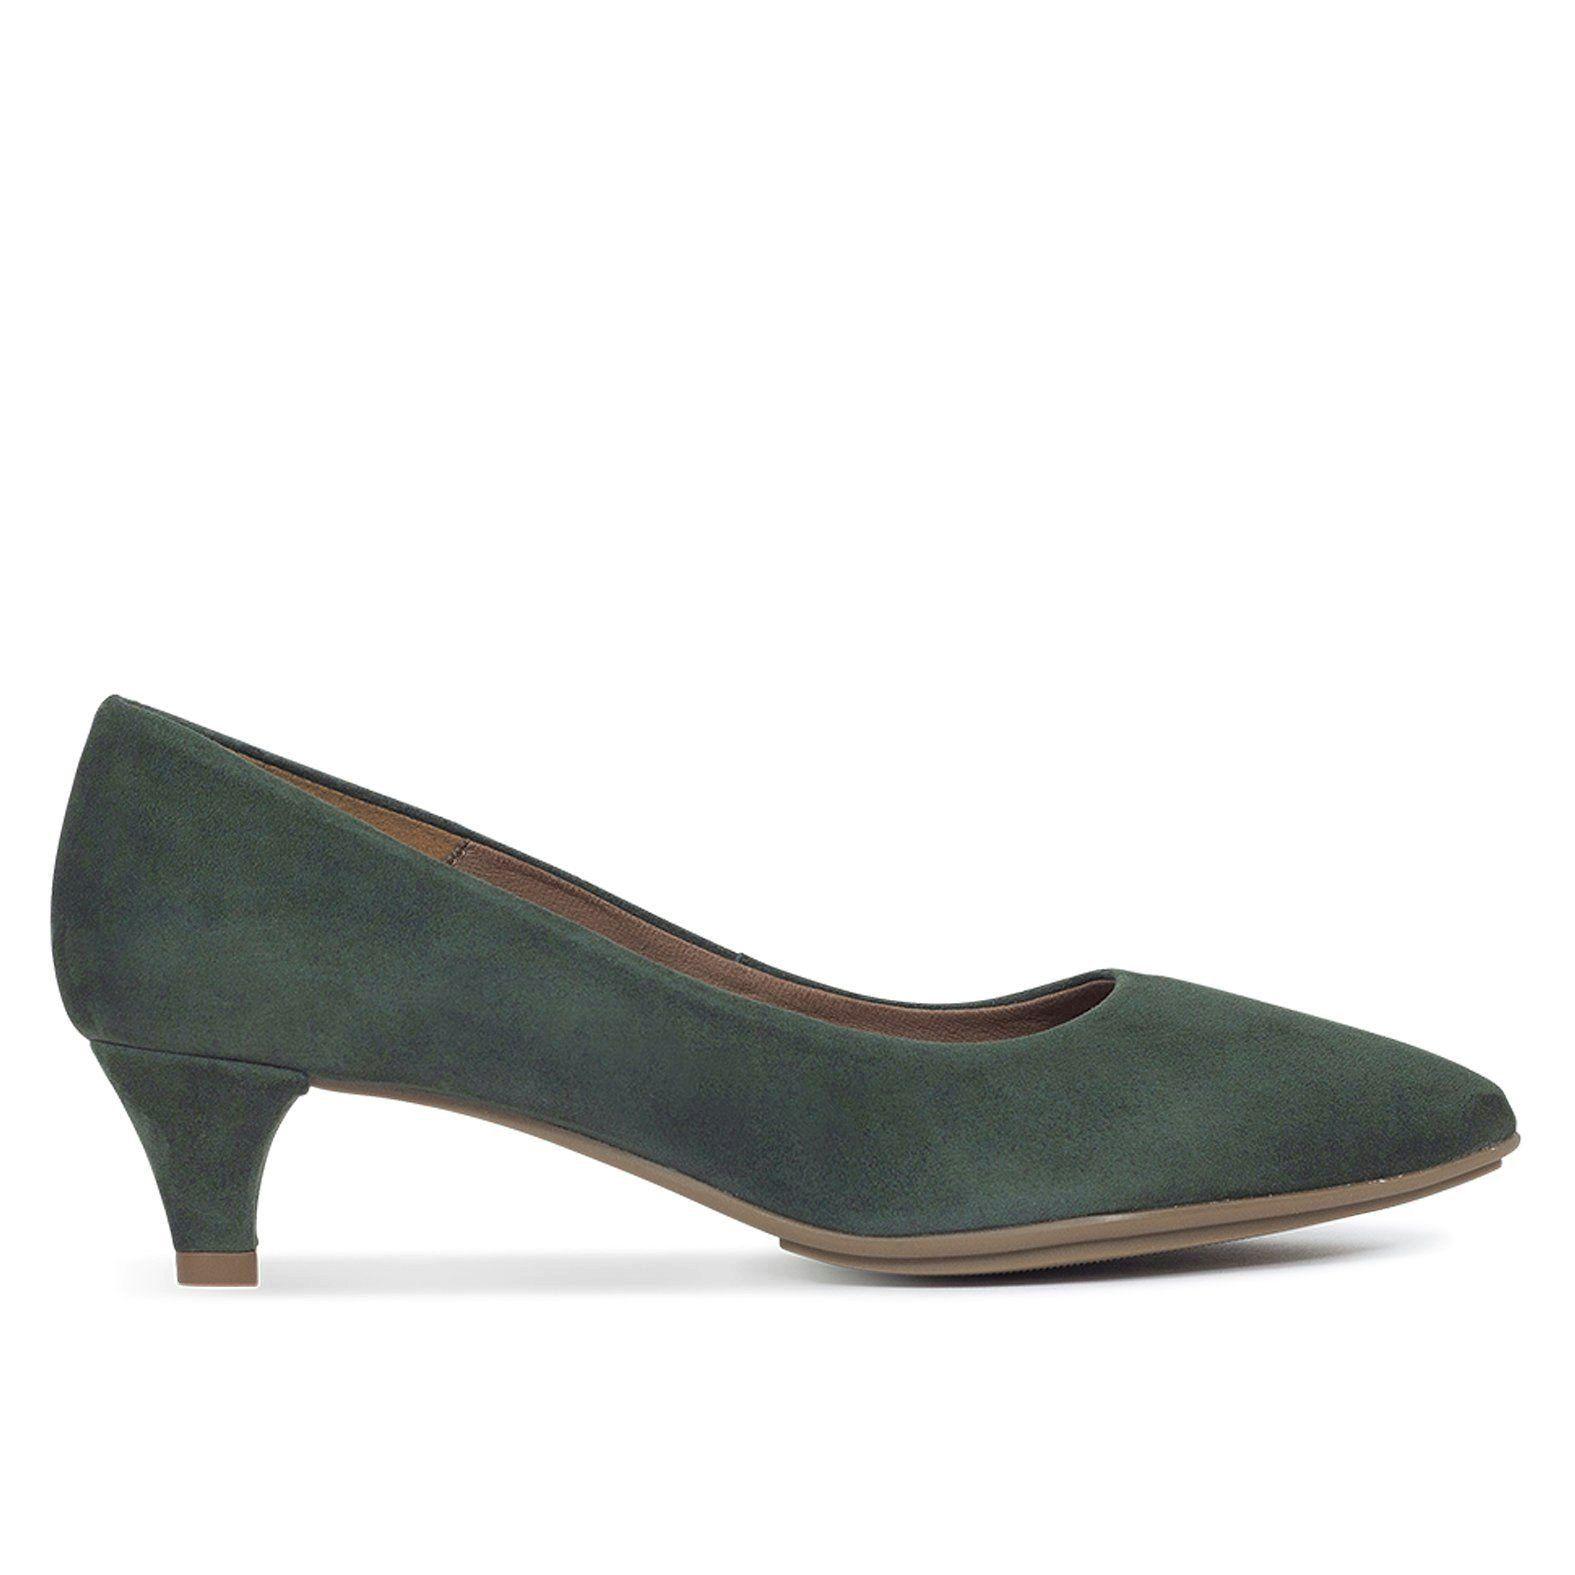 d5614987 Zapatos de mujer stilettos VERDE BOTELLA – Zapatos miMaO Online – miMaO  ShopOnline